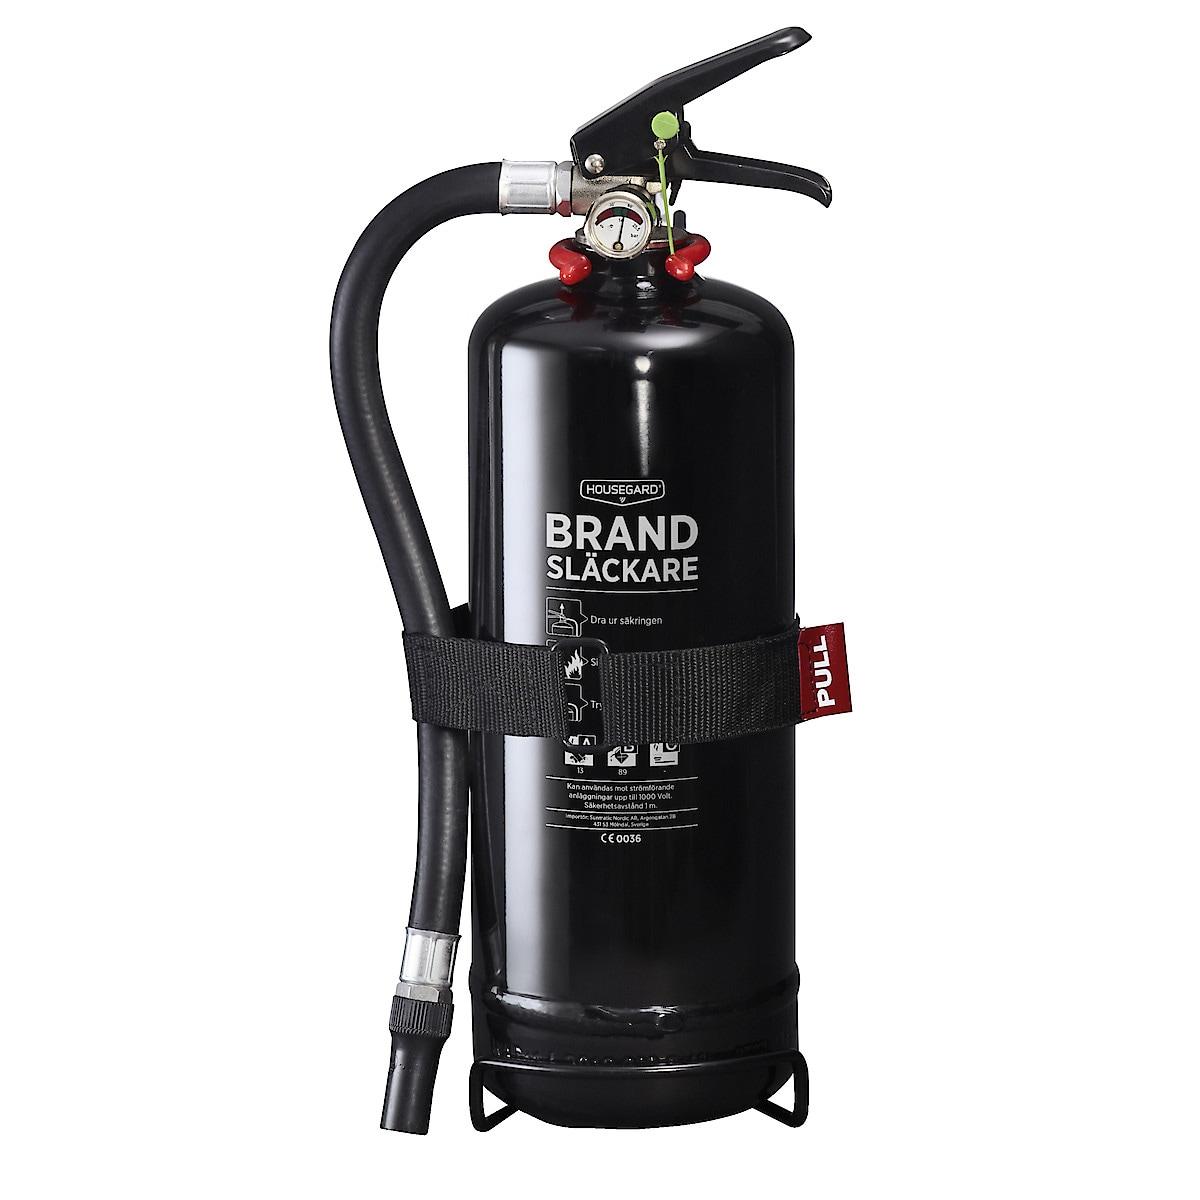 Brandsläckare 2 kg Housegard